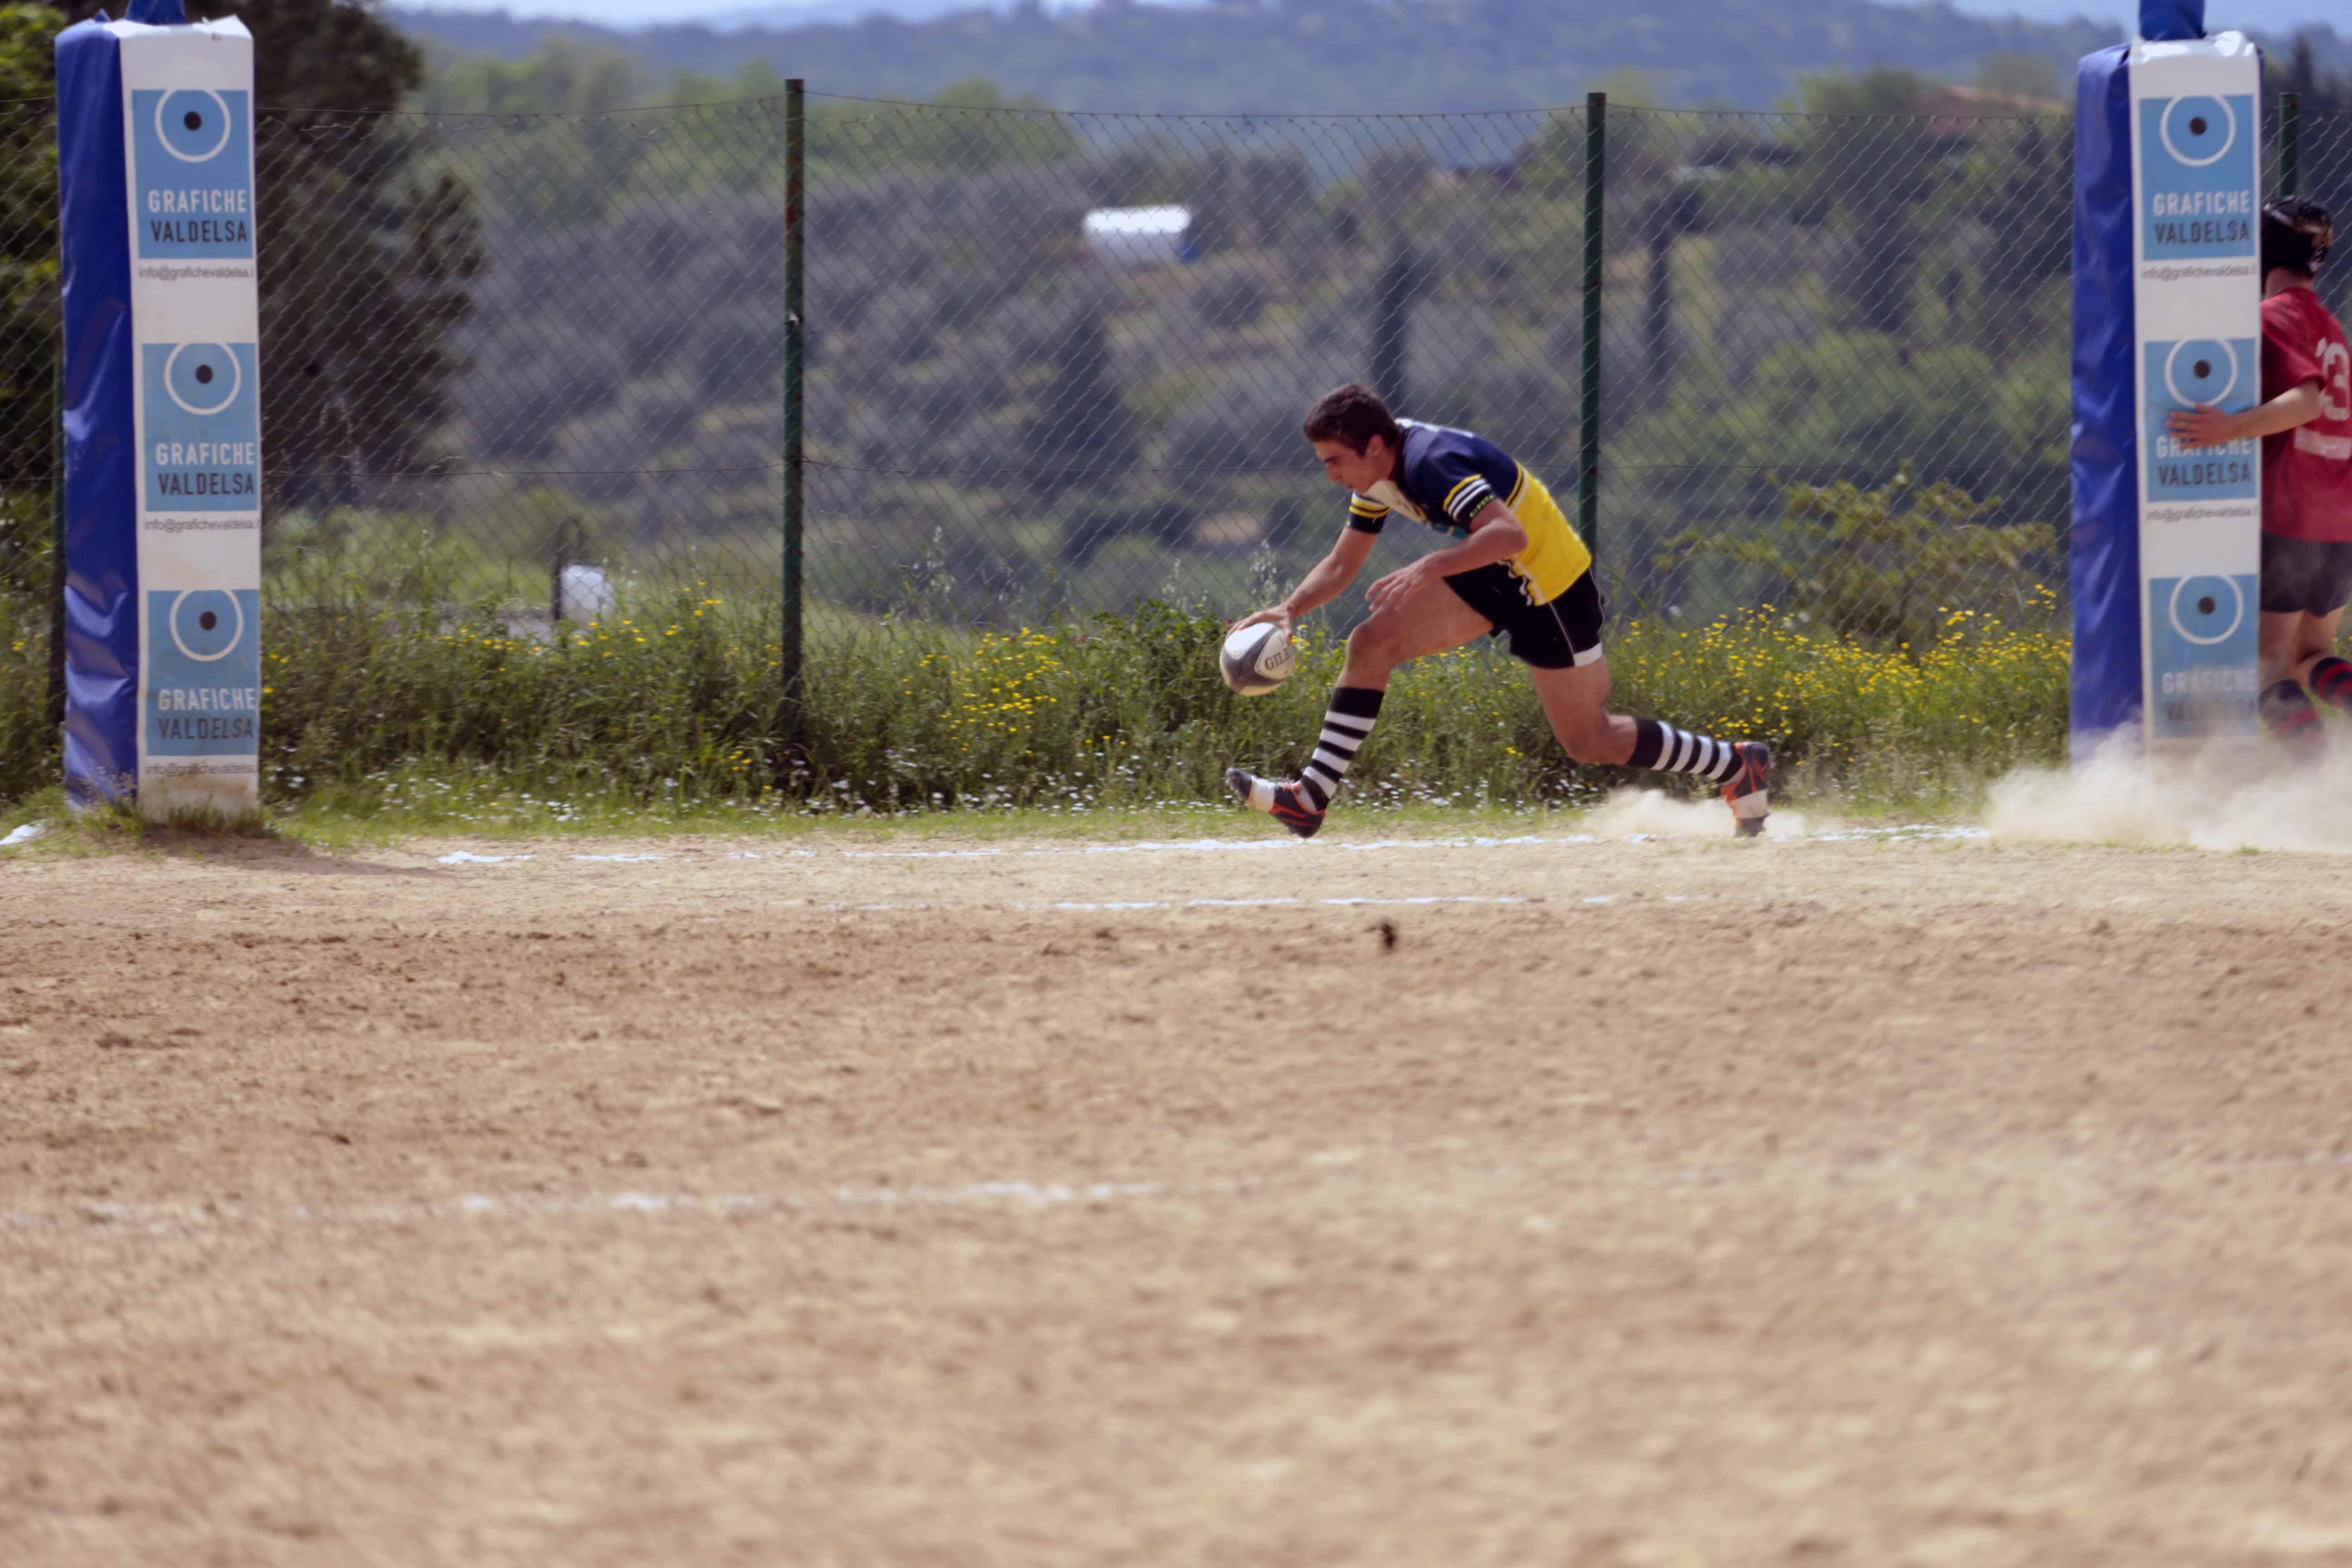 Grafiche Valdelsa FTGI Ghibellini – Imola Rugby